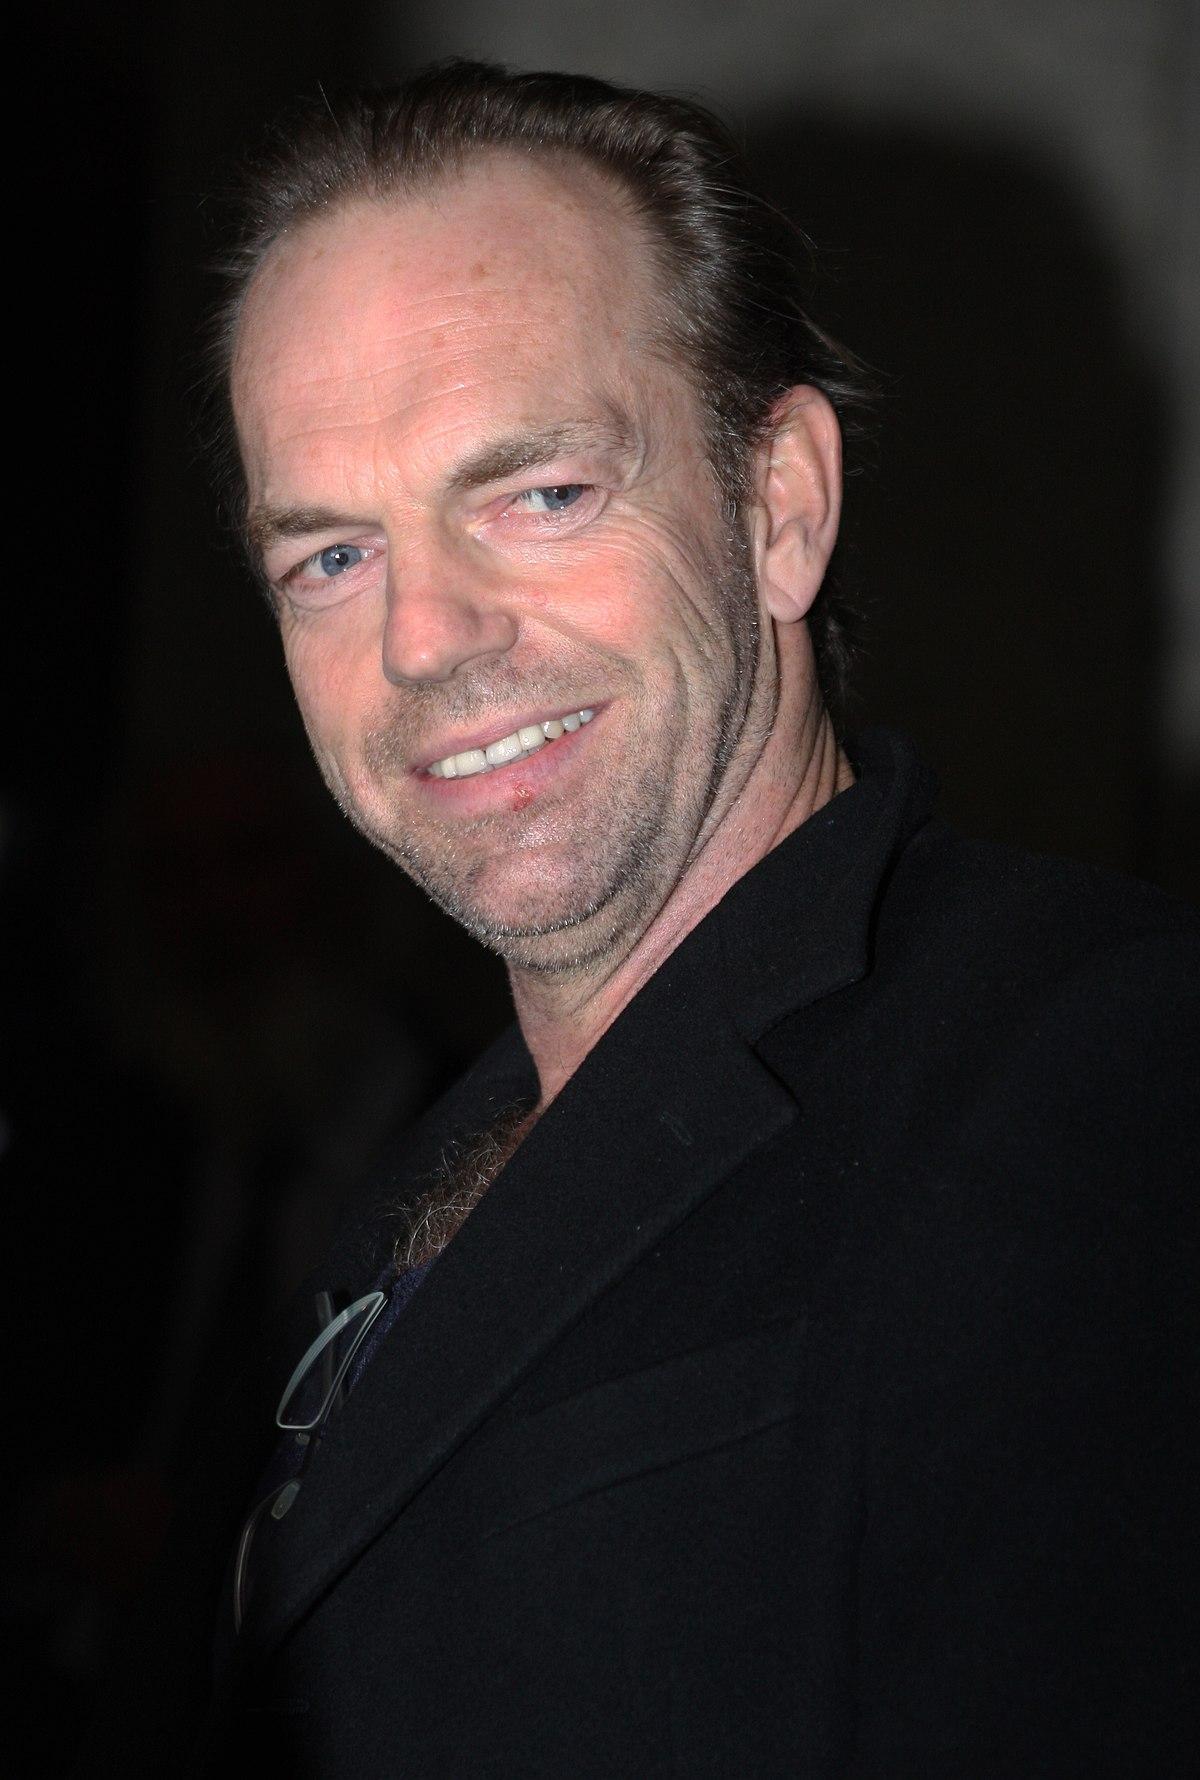 Hugo Weaving - Wikiquote